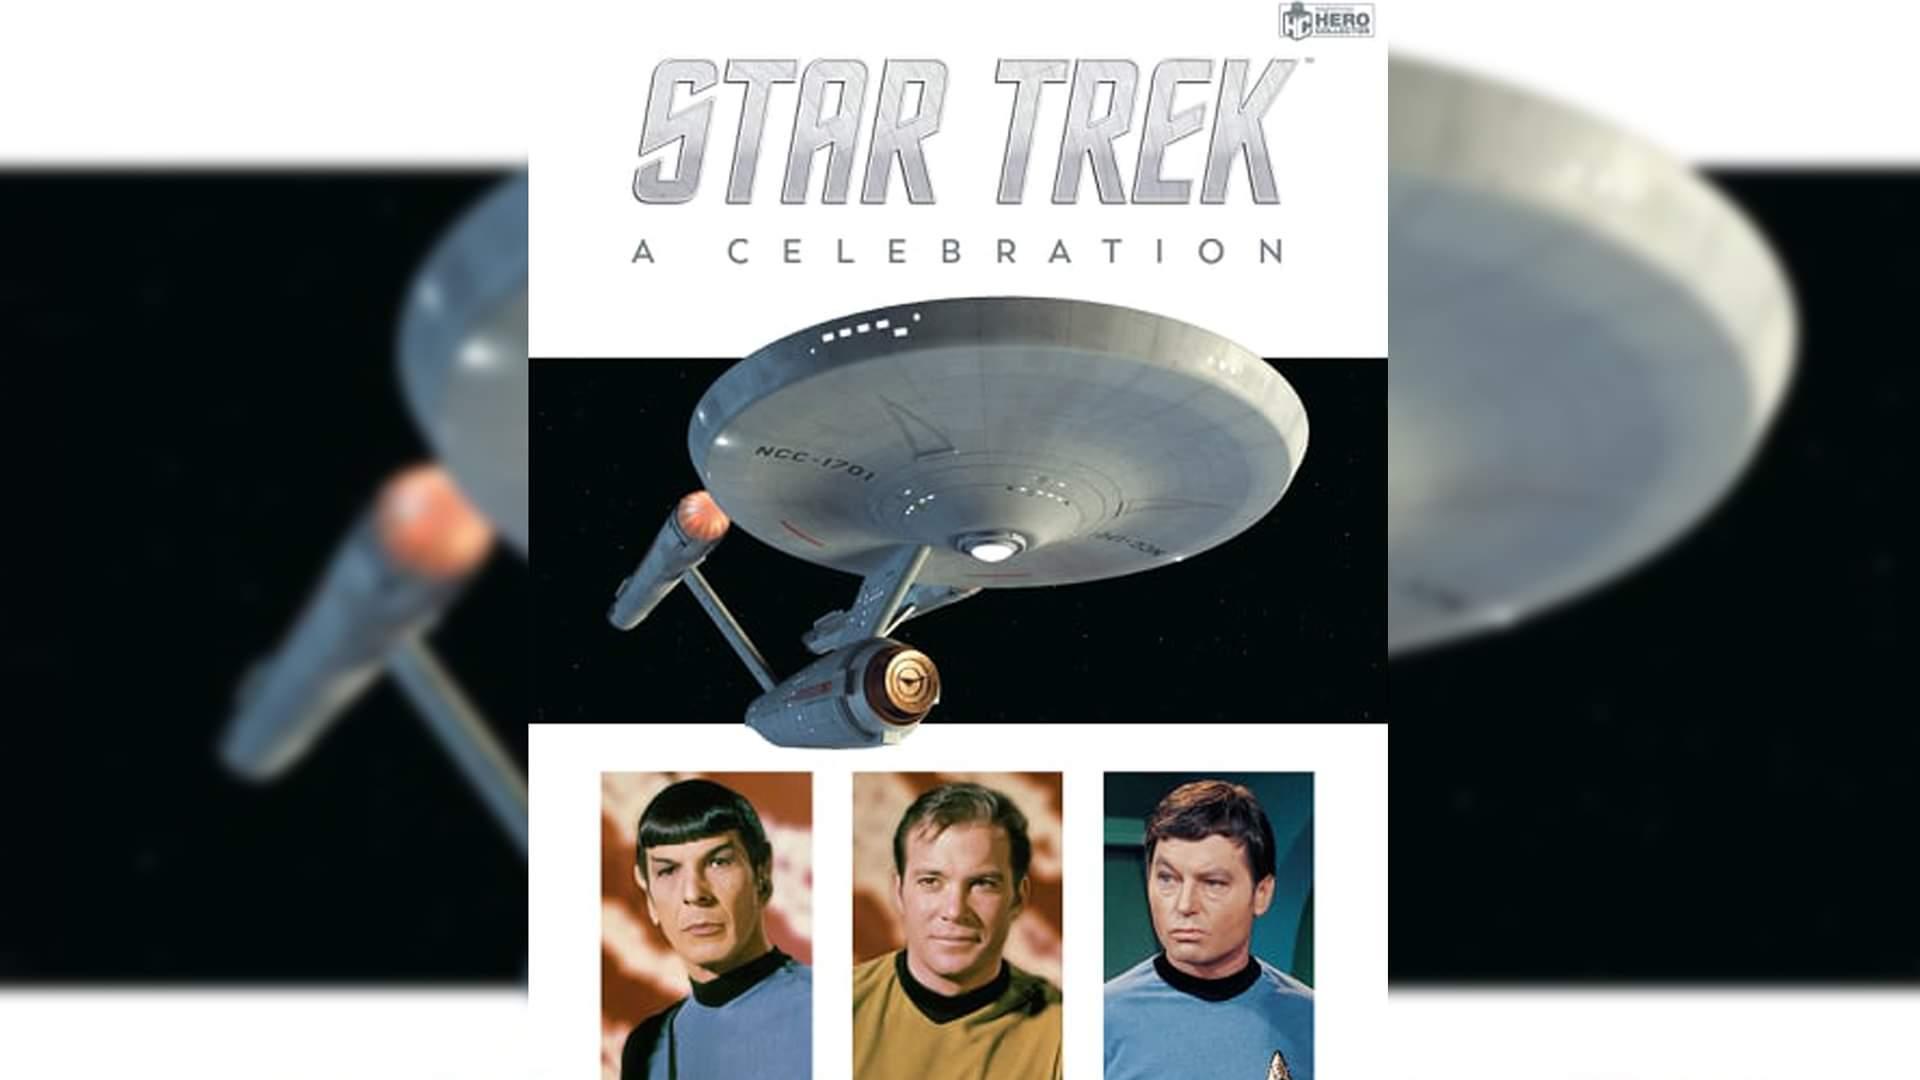 New Star Trek Book Celebrates the Legacy of the Franchise